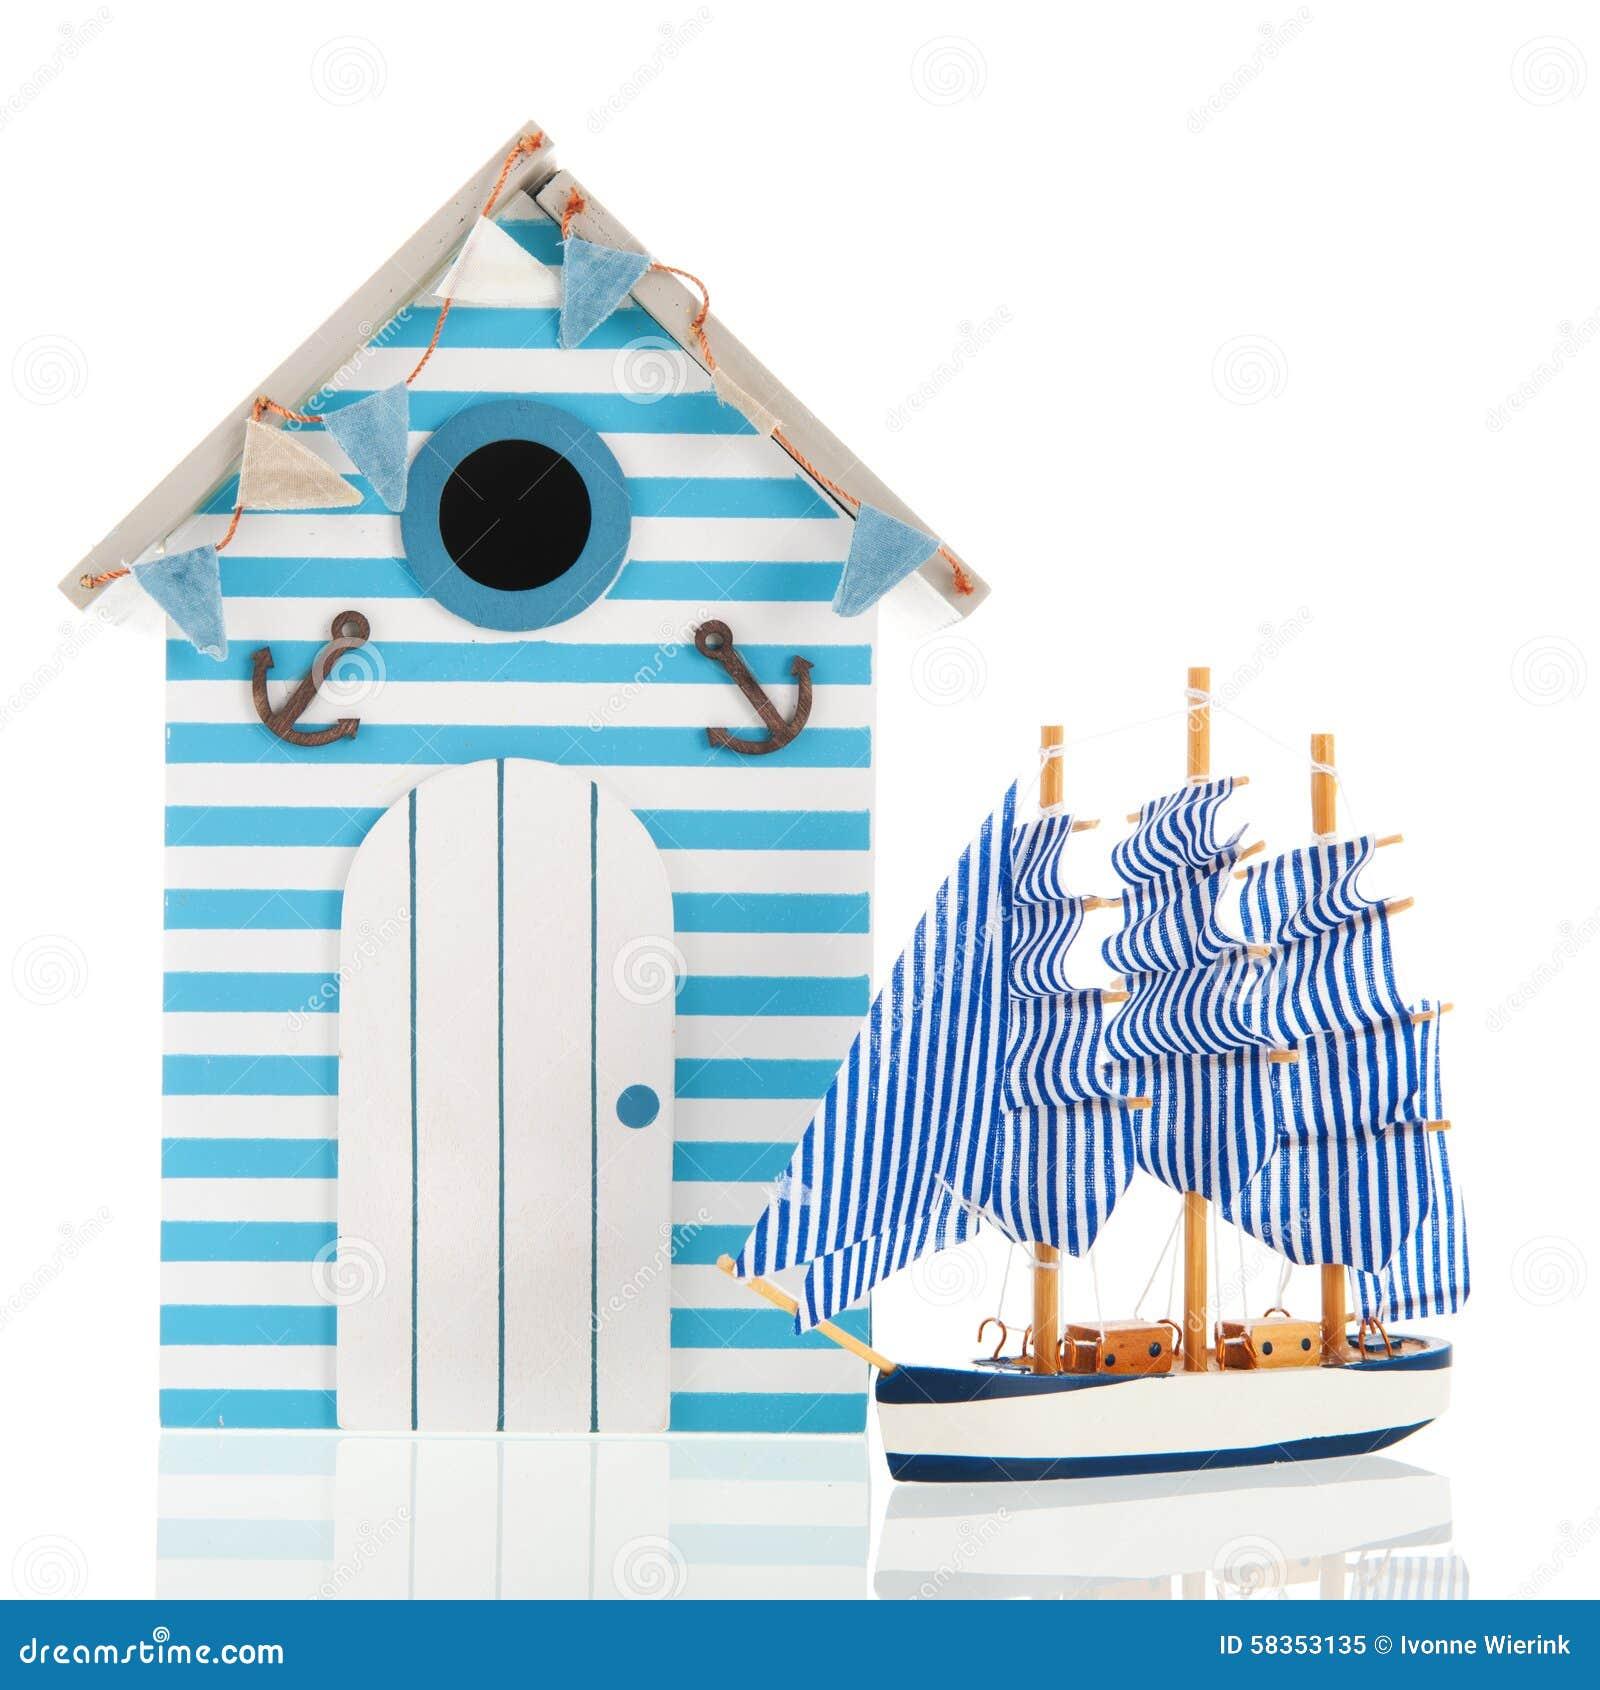 Beach Hut And Boat Stock Photo - Image: 58353135